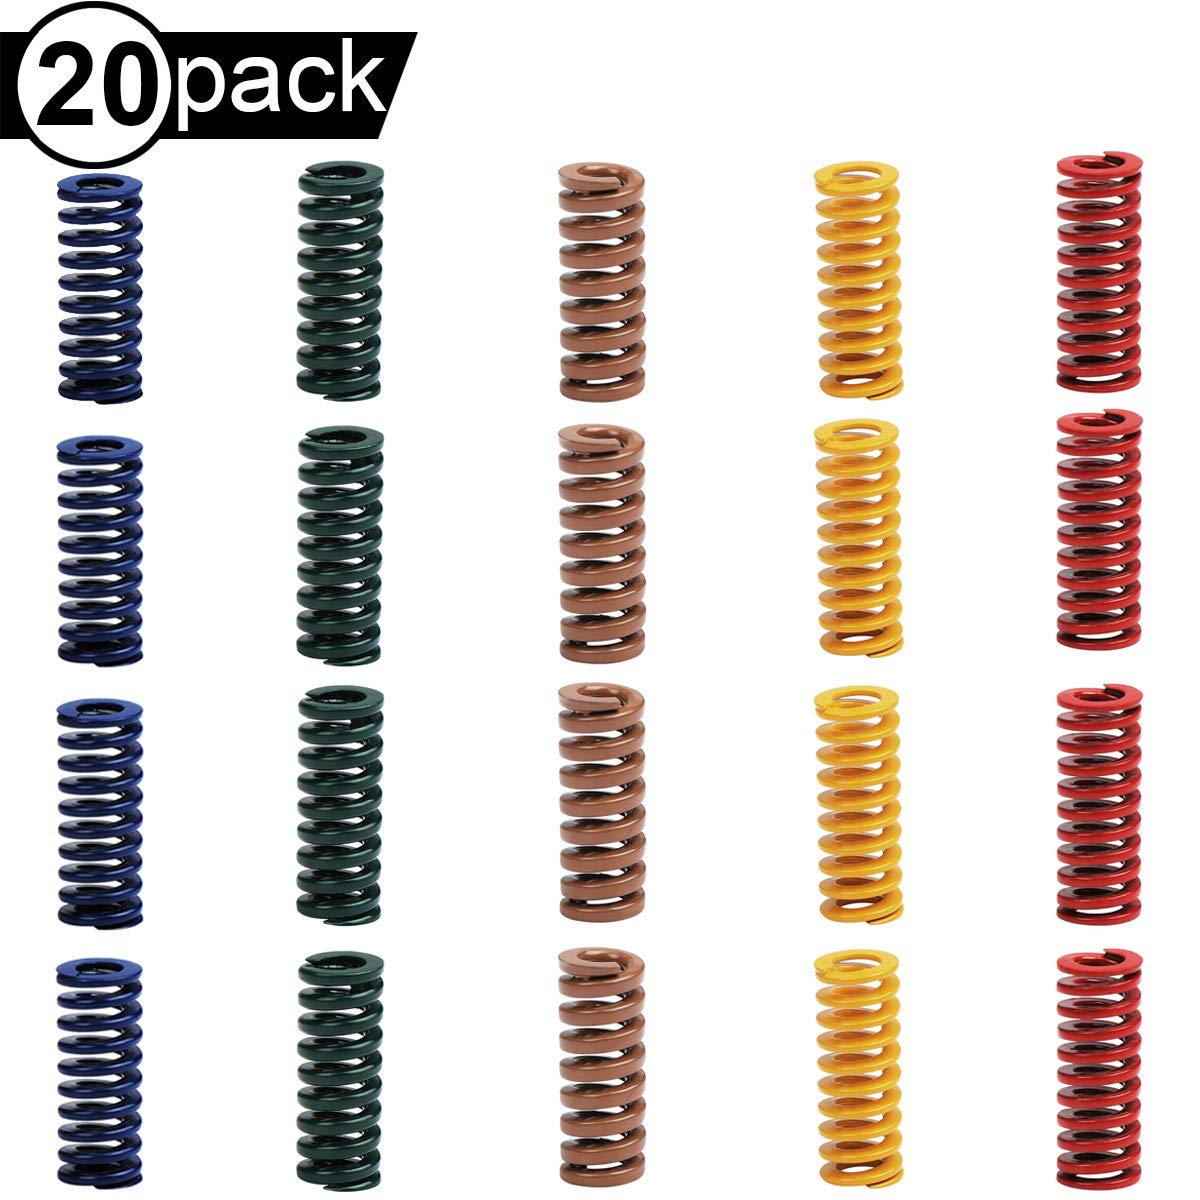 Youmile 20 ST/ÜCKE Druckform Matrizenfedern 8mm OD 20mm L/änge 5 Farbe 3D Drucker Motherboard Zubeh/ör F/ür 3D Drucker CR-10 CR-10S Ender